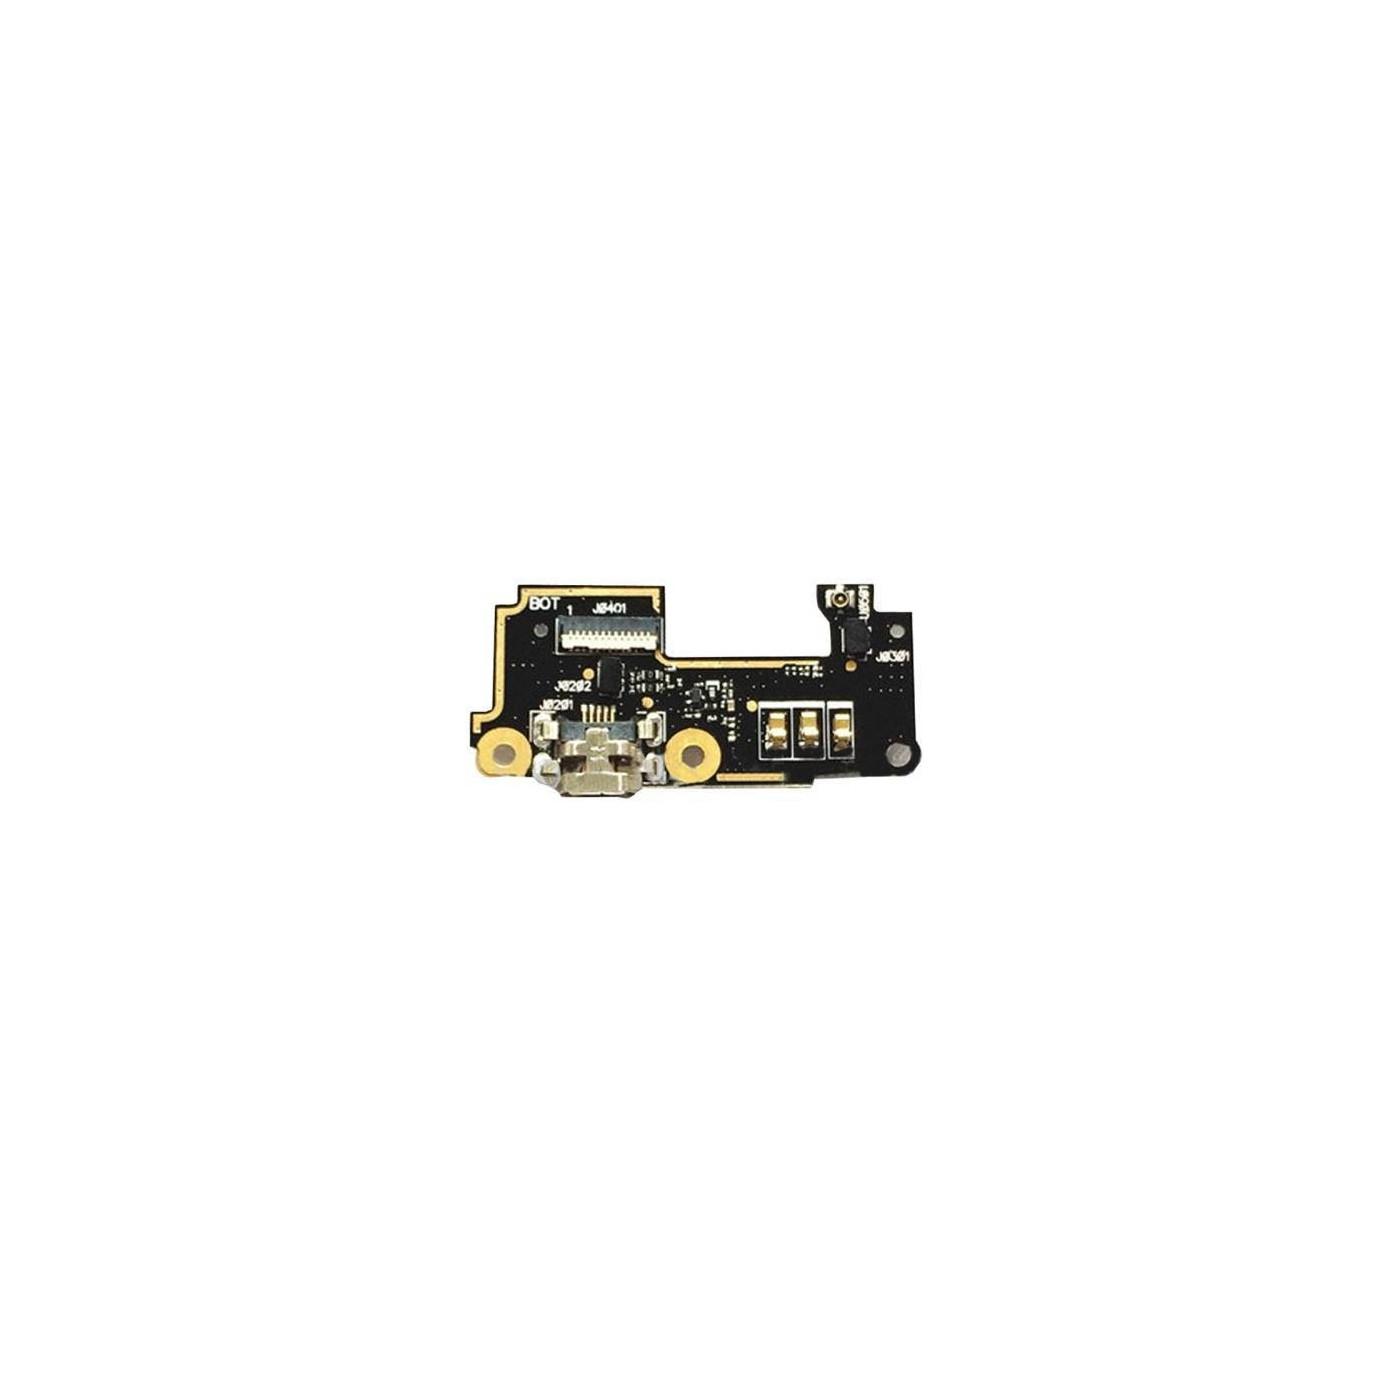 Flat flex connettore di ricarica per Asus Zenfone 5 dock carica dati ricambio